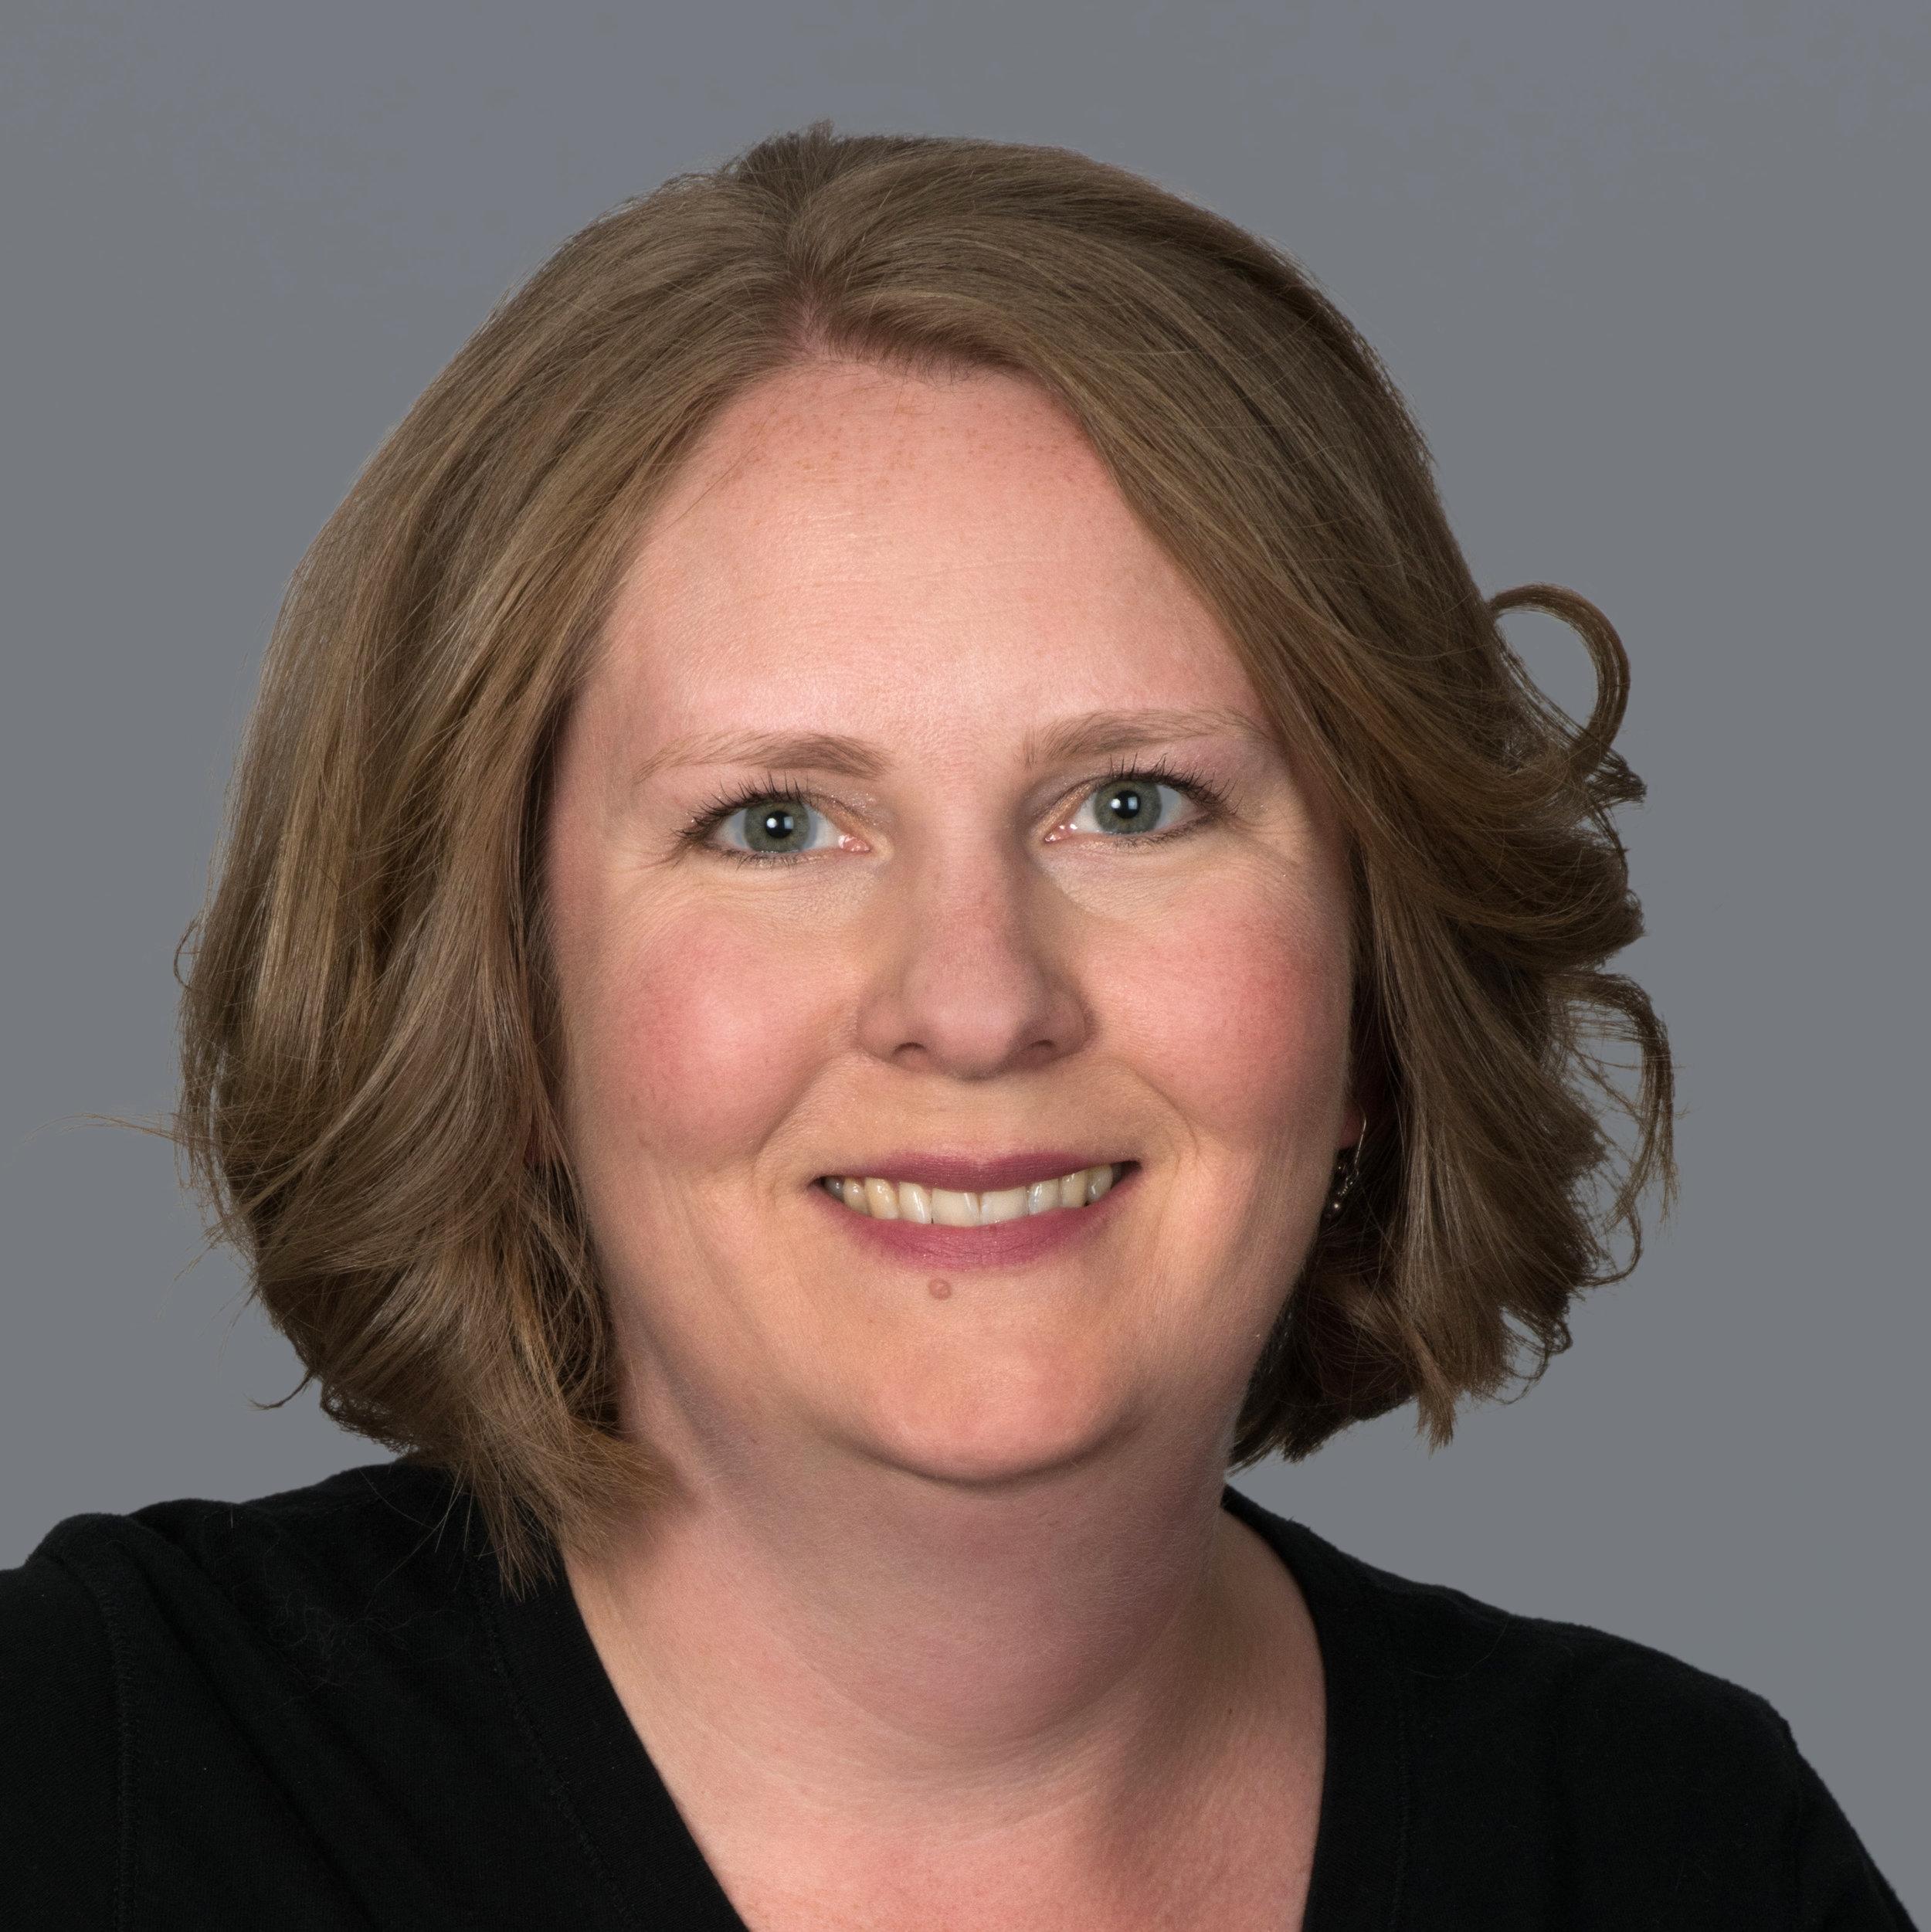 Erika Noerenberg, Senior Malware Analyst, LogRhythm